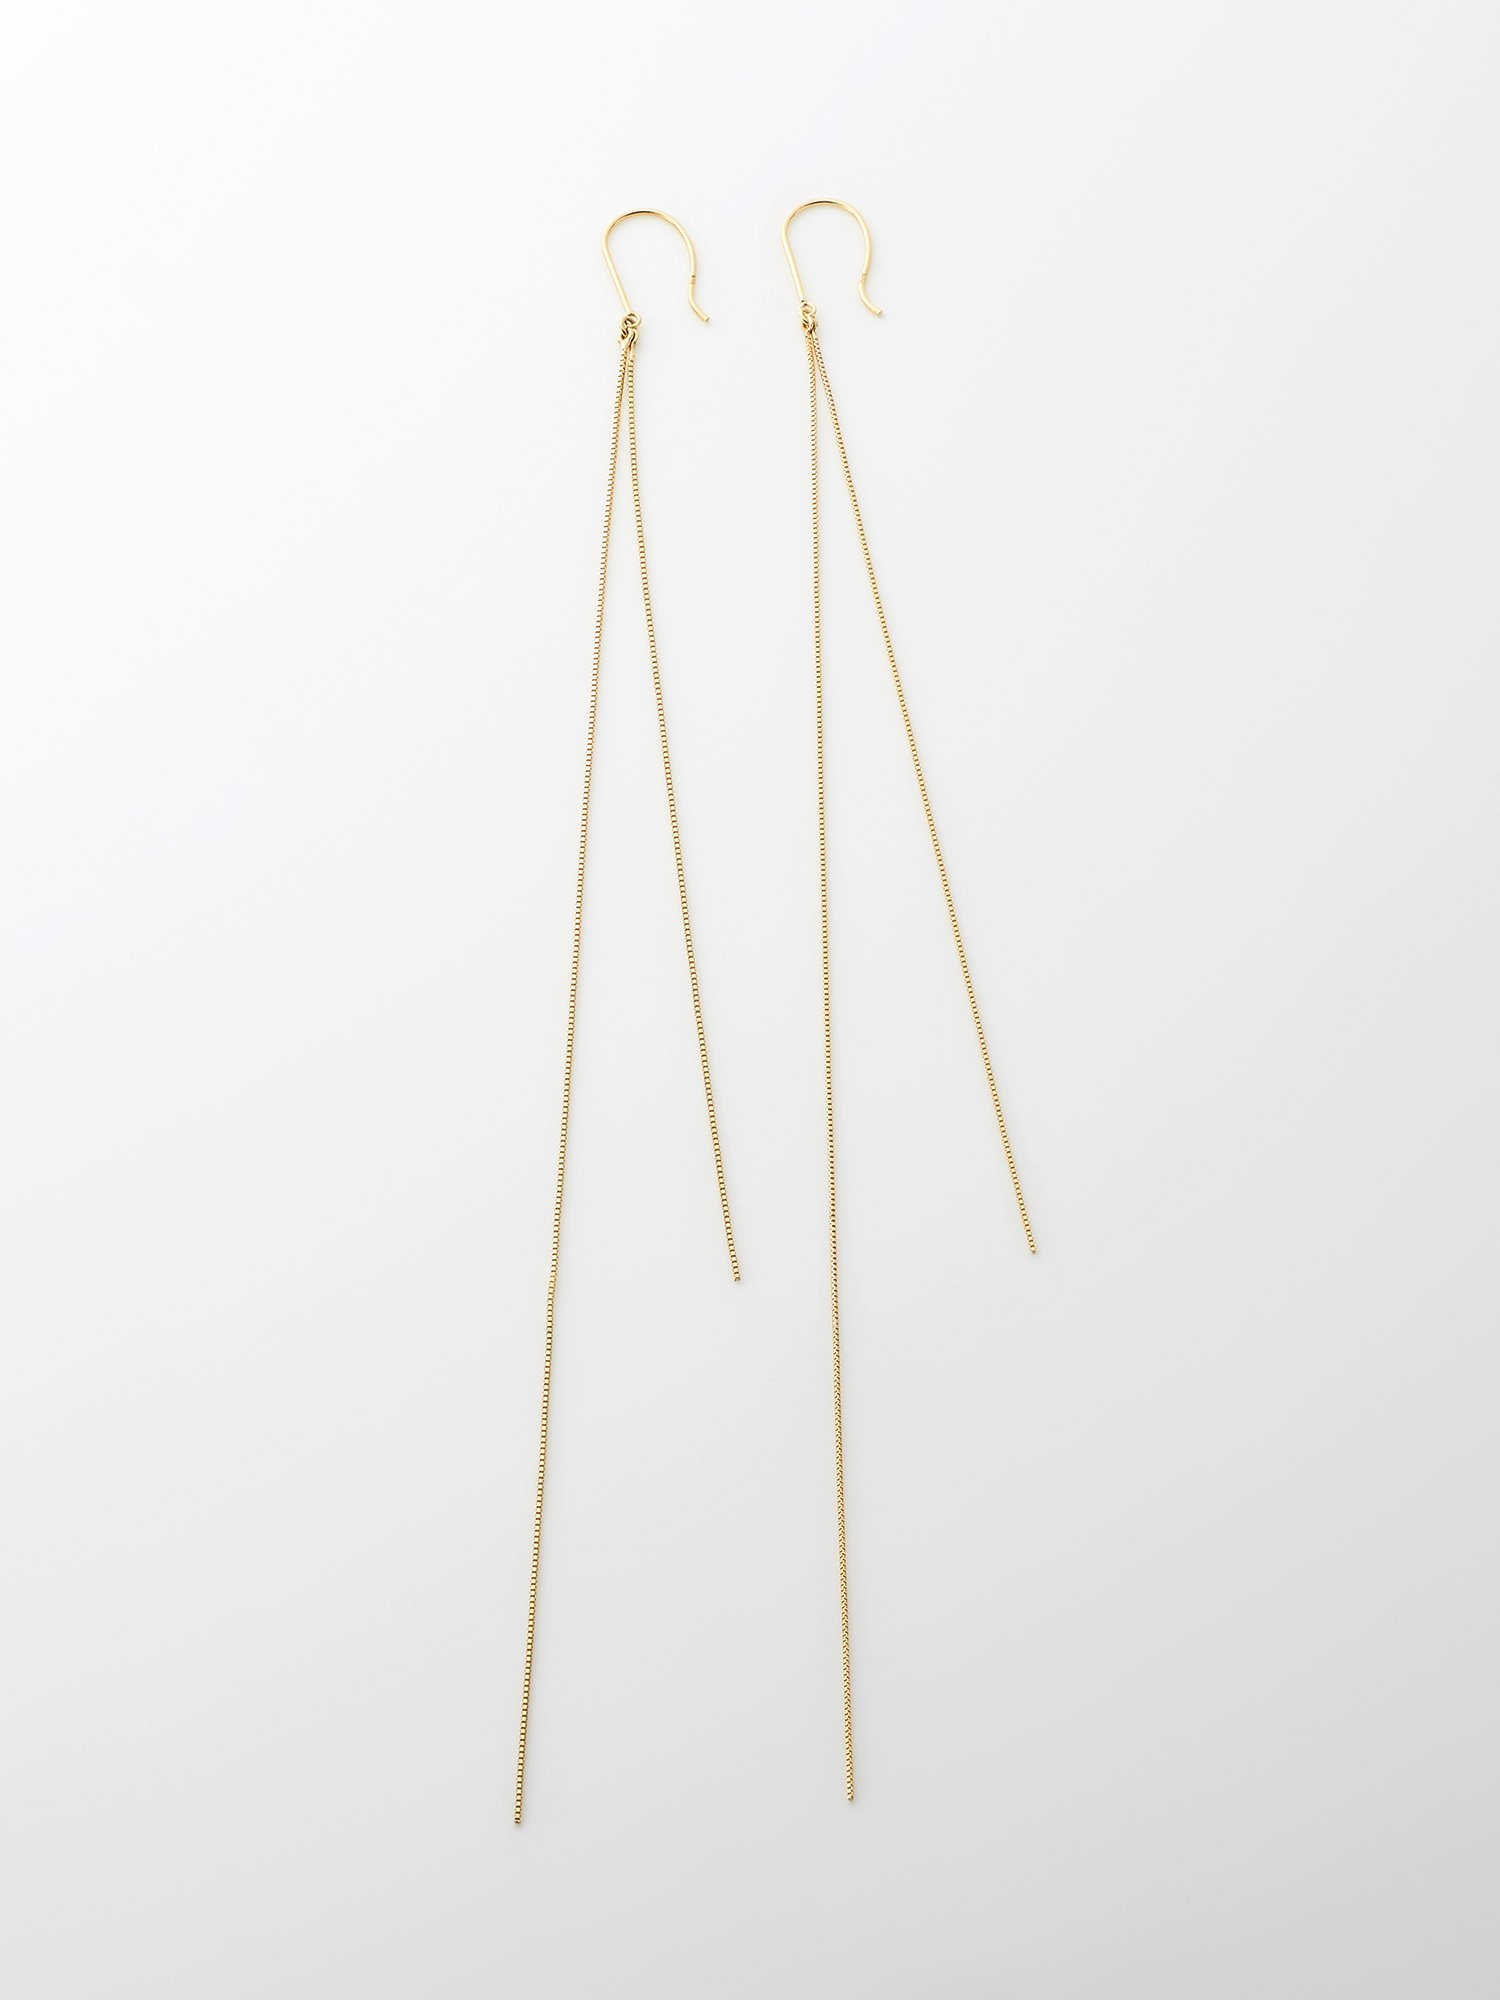 SOPHISTICATED VINTAGE / Gold line earrings / Long / 在庫商品